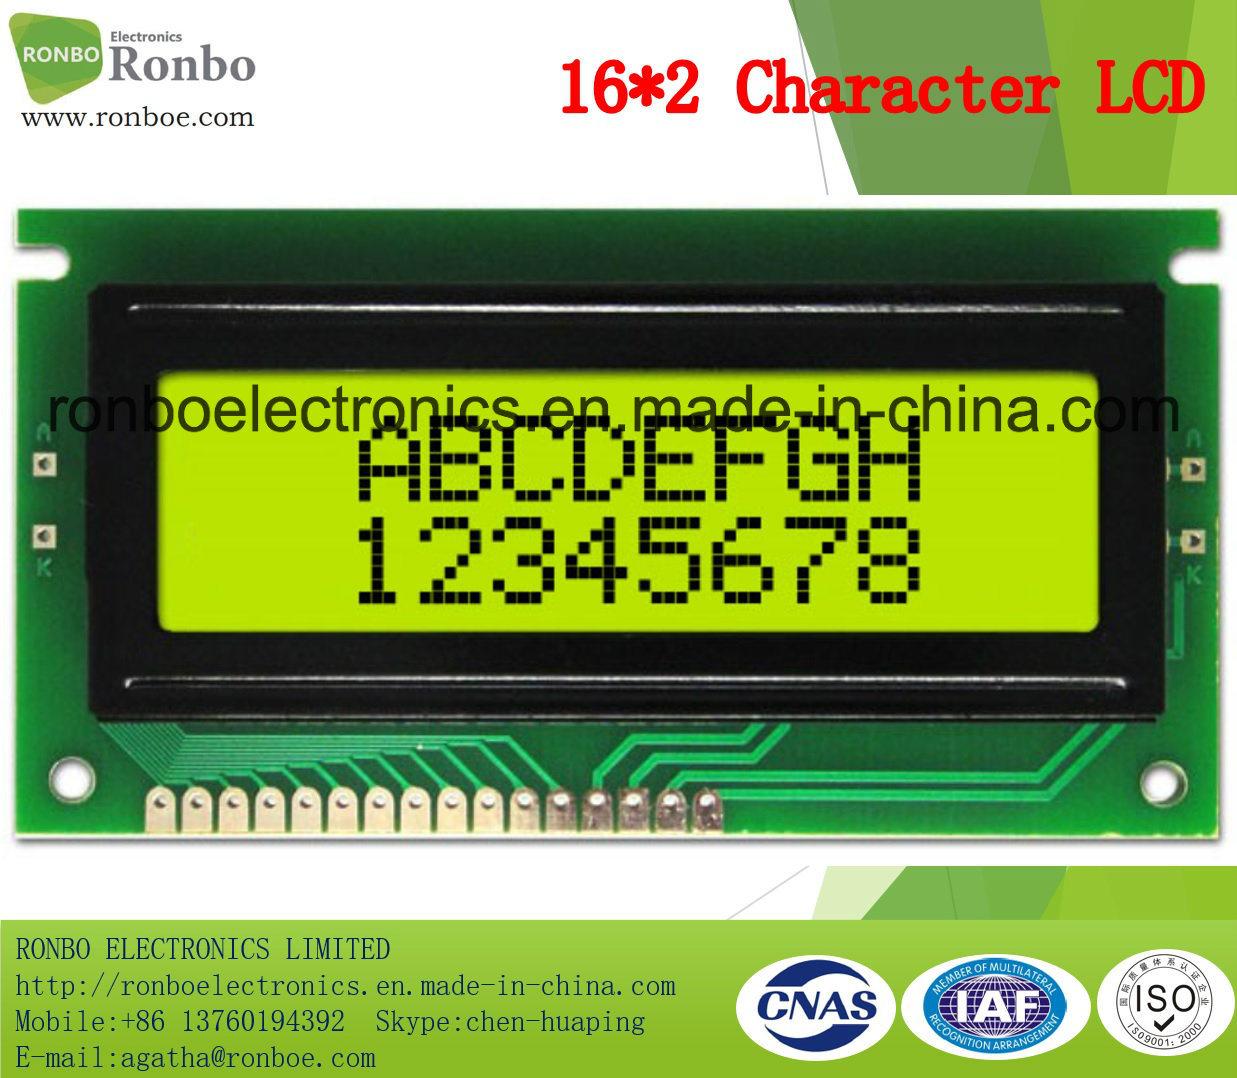 16X2 Stn Character LCM Display, MCU 8bit, Y-G Backlight, COB LCM Screen